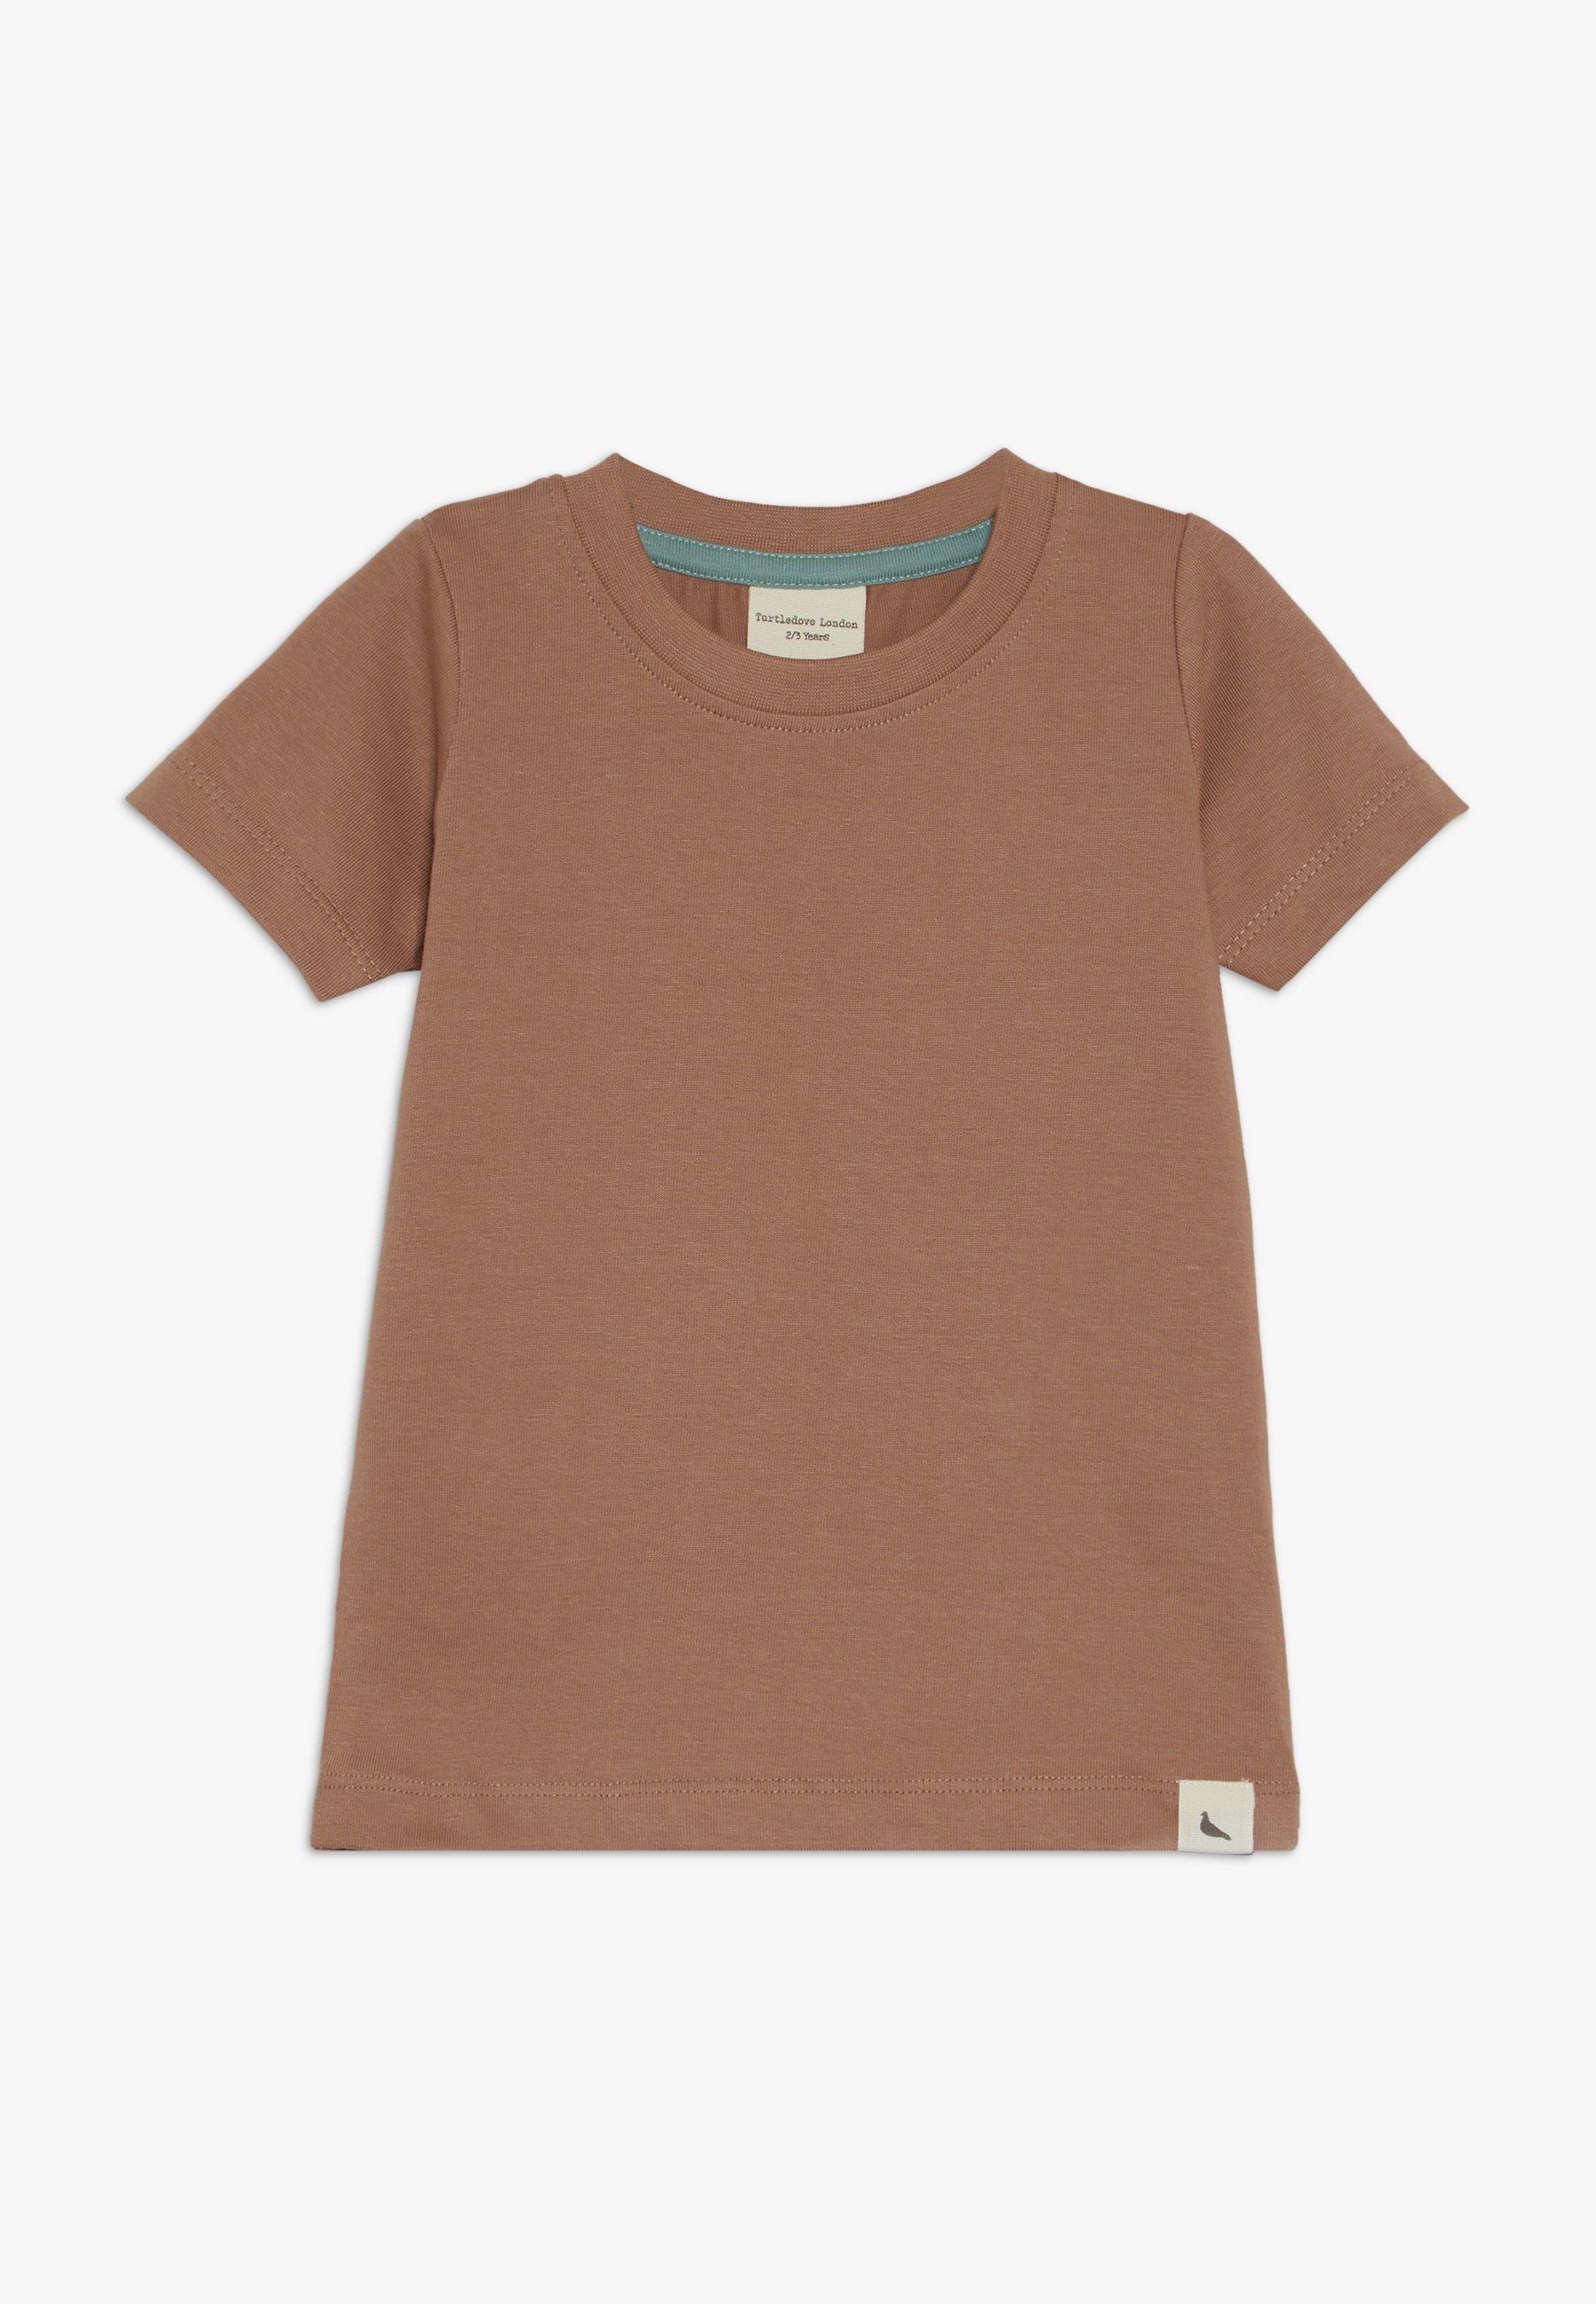 2013 Wholesale Turtledove LAYERING STRIPE BABY 3 PACK  - Print T-shirt - multi | kids's clothing 2020 VcpaU